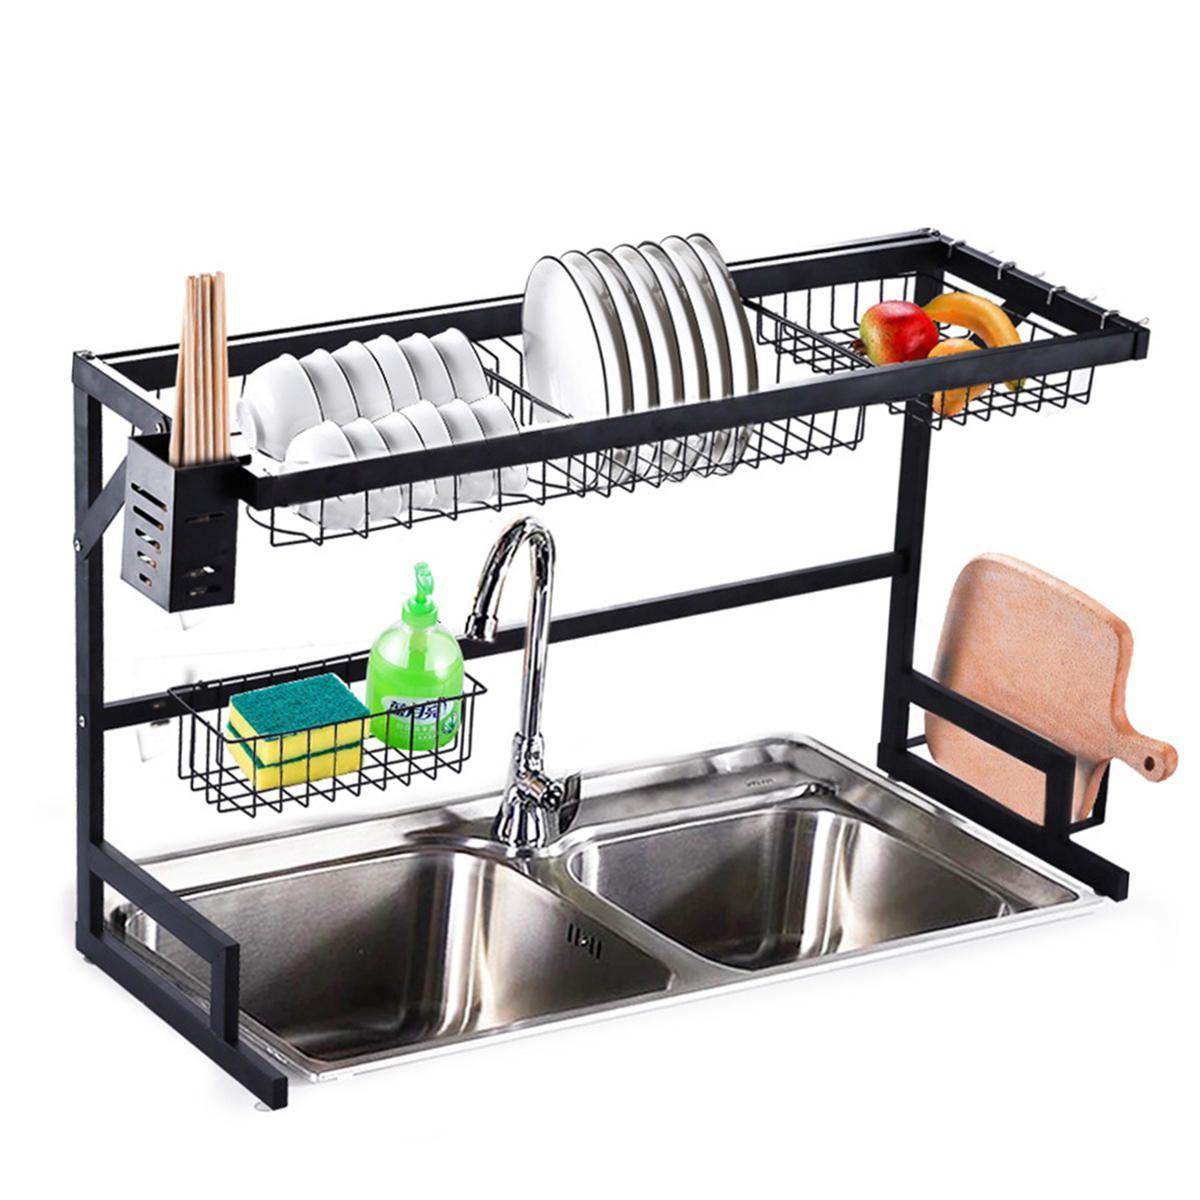 2 Tier Dish Drainer Over Double Sink Drying Rack Draining Tray Fruit Plate Bowl Kitchen Storage RackHardware & AccessoriesfromFurniture & Home Improvementon banggood.com